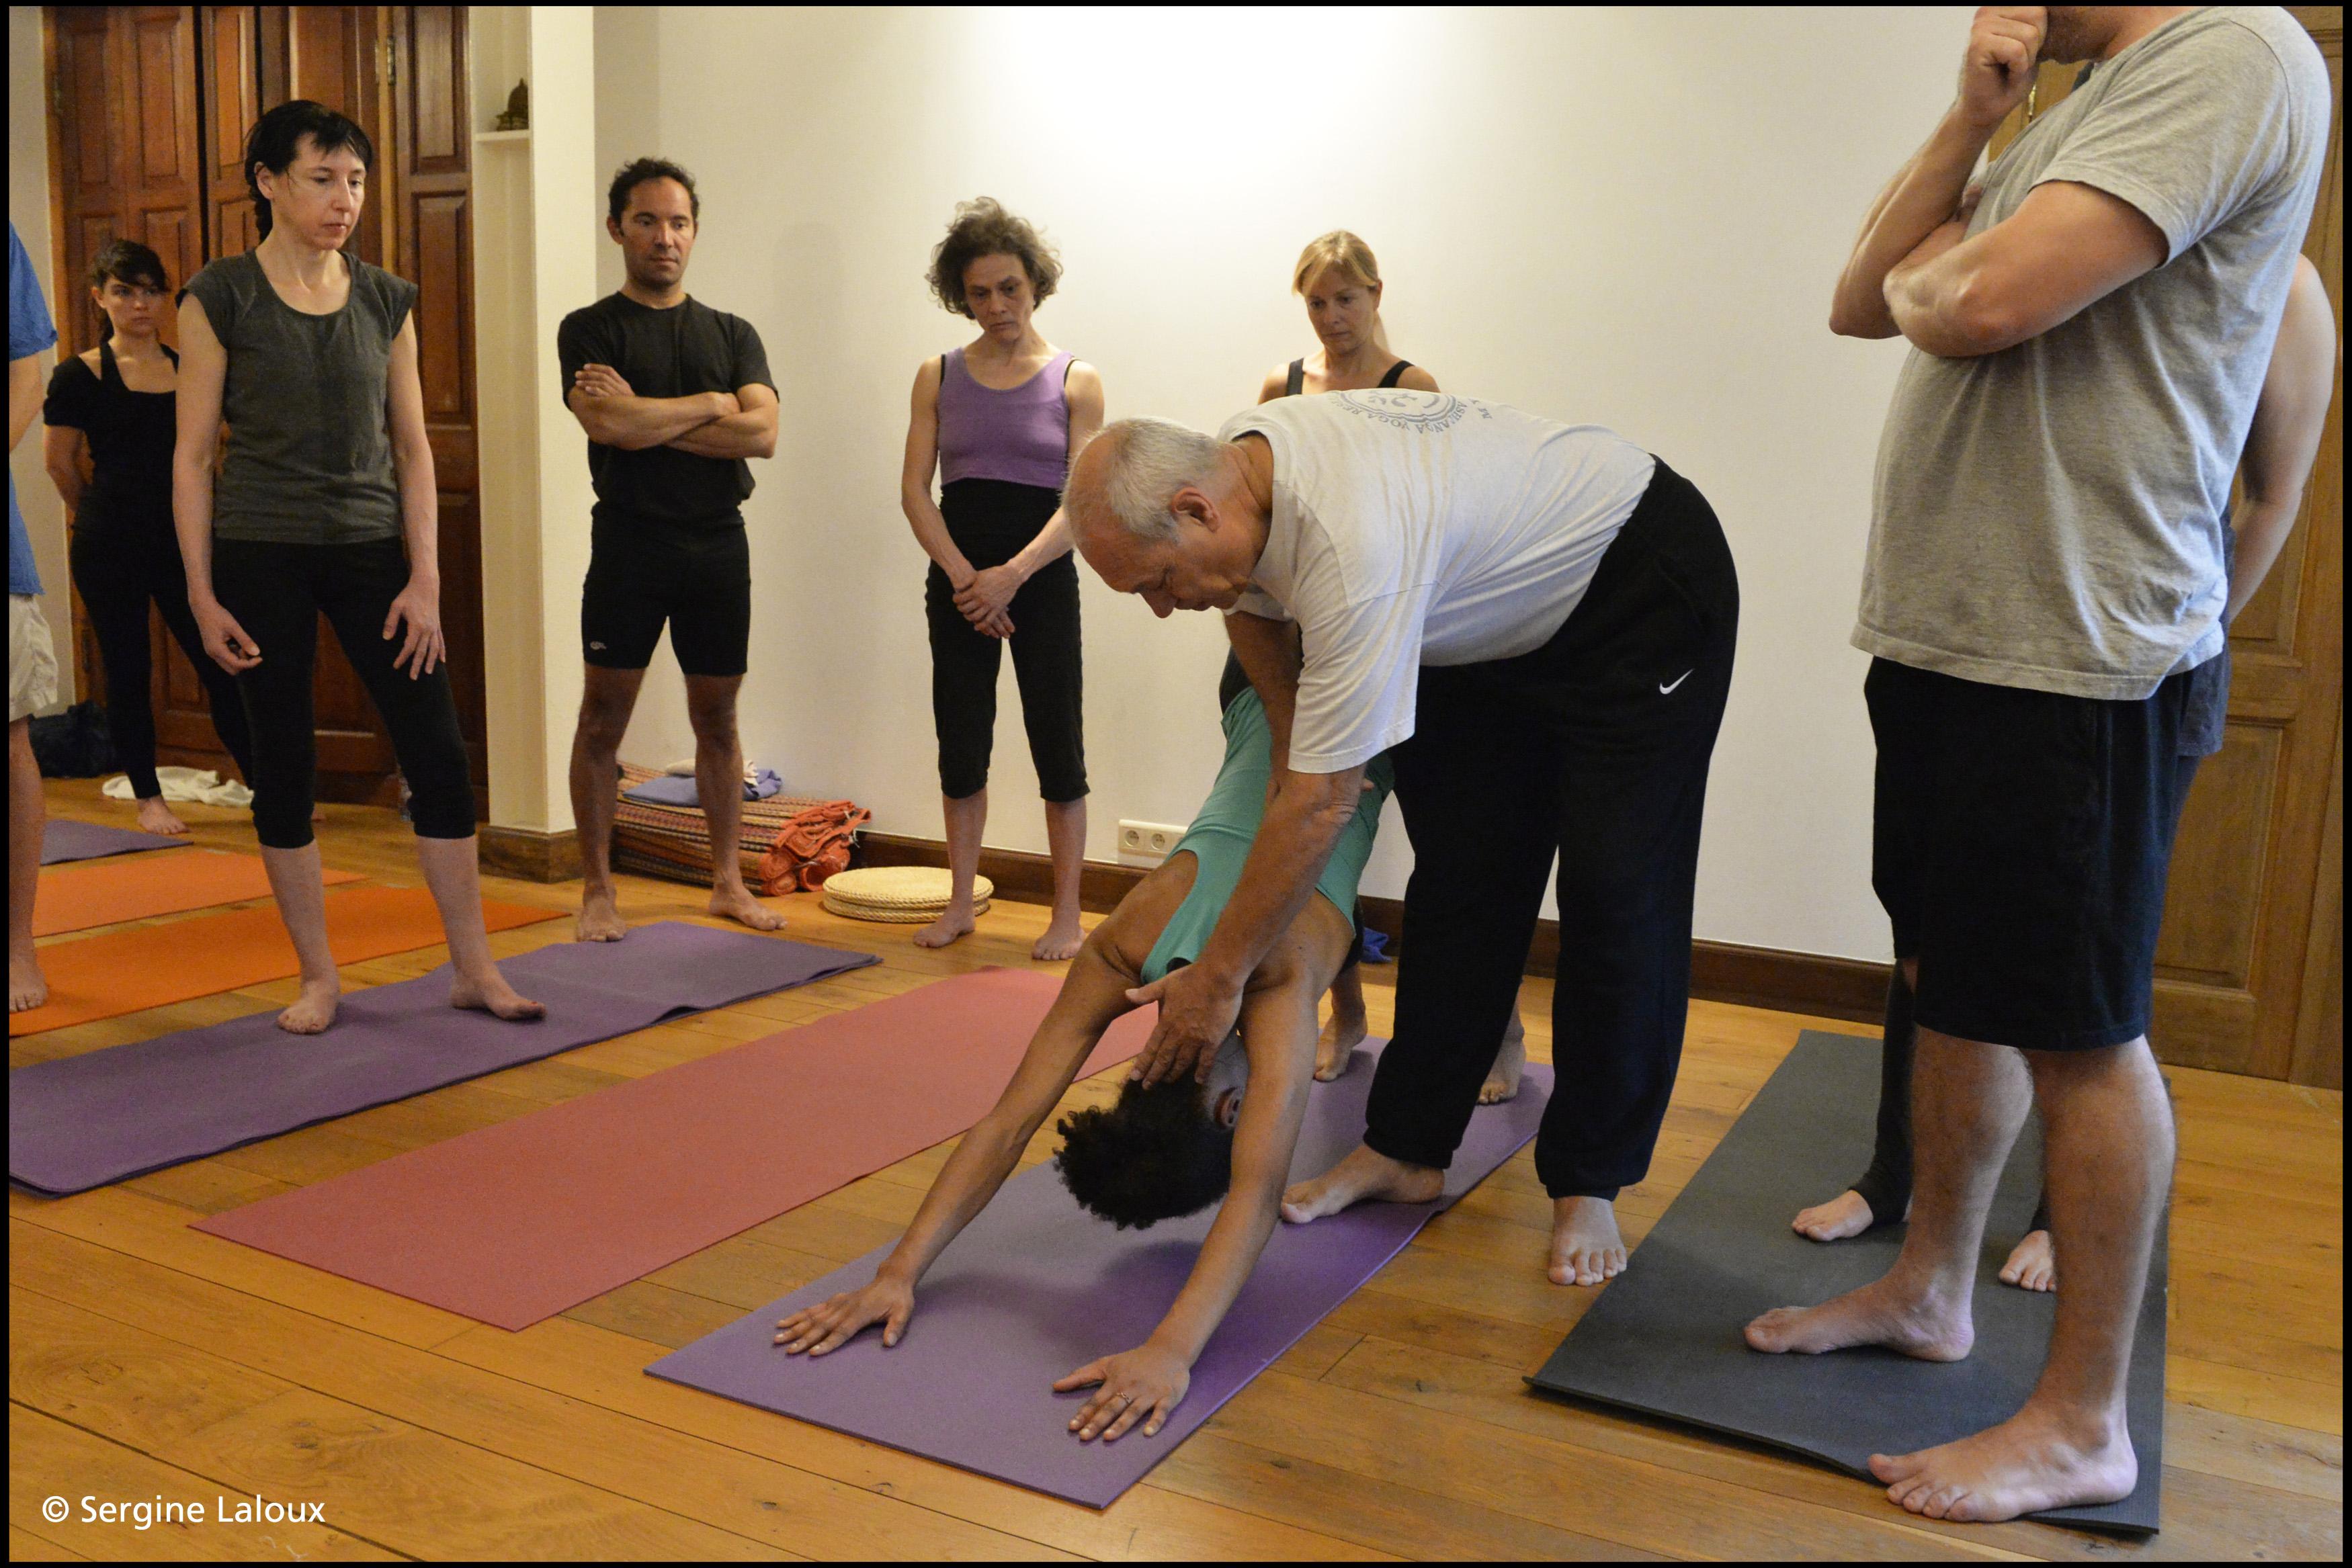 devenir professeur d 39 ashtanga yoga gr ce la formation propos e ashtanga yoga institute. Black Bedroom Furniture Sets. Home Design Ideas